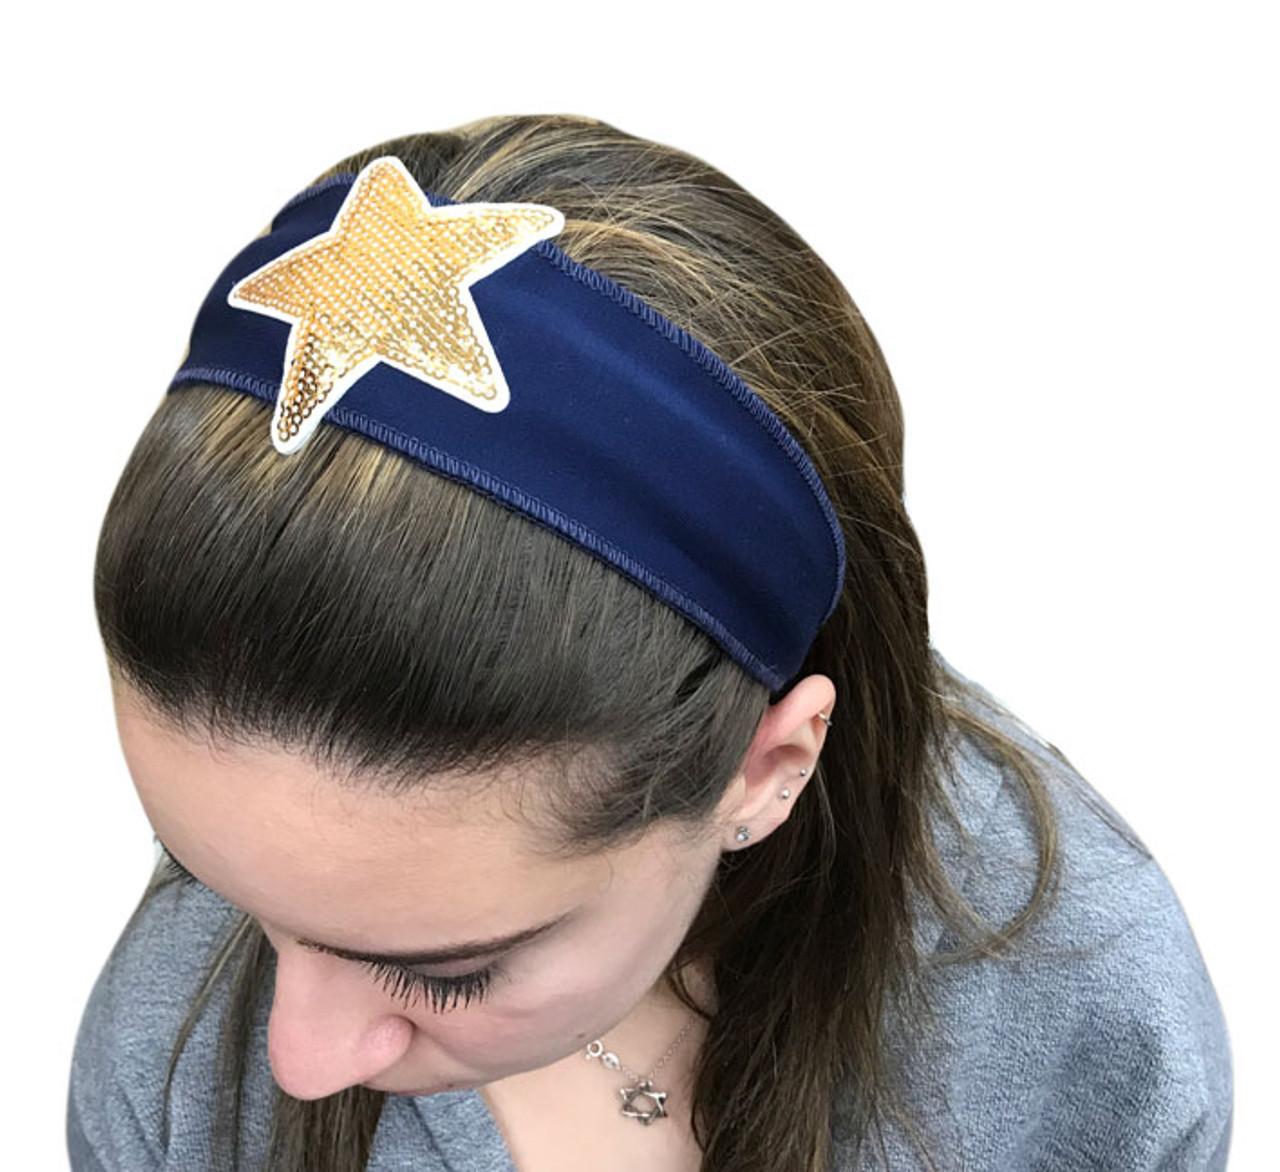 Gold Star Patch Headband